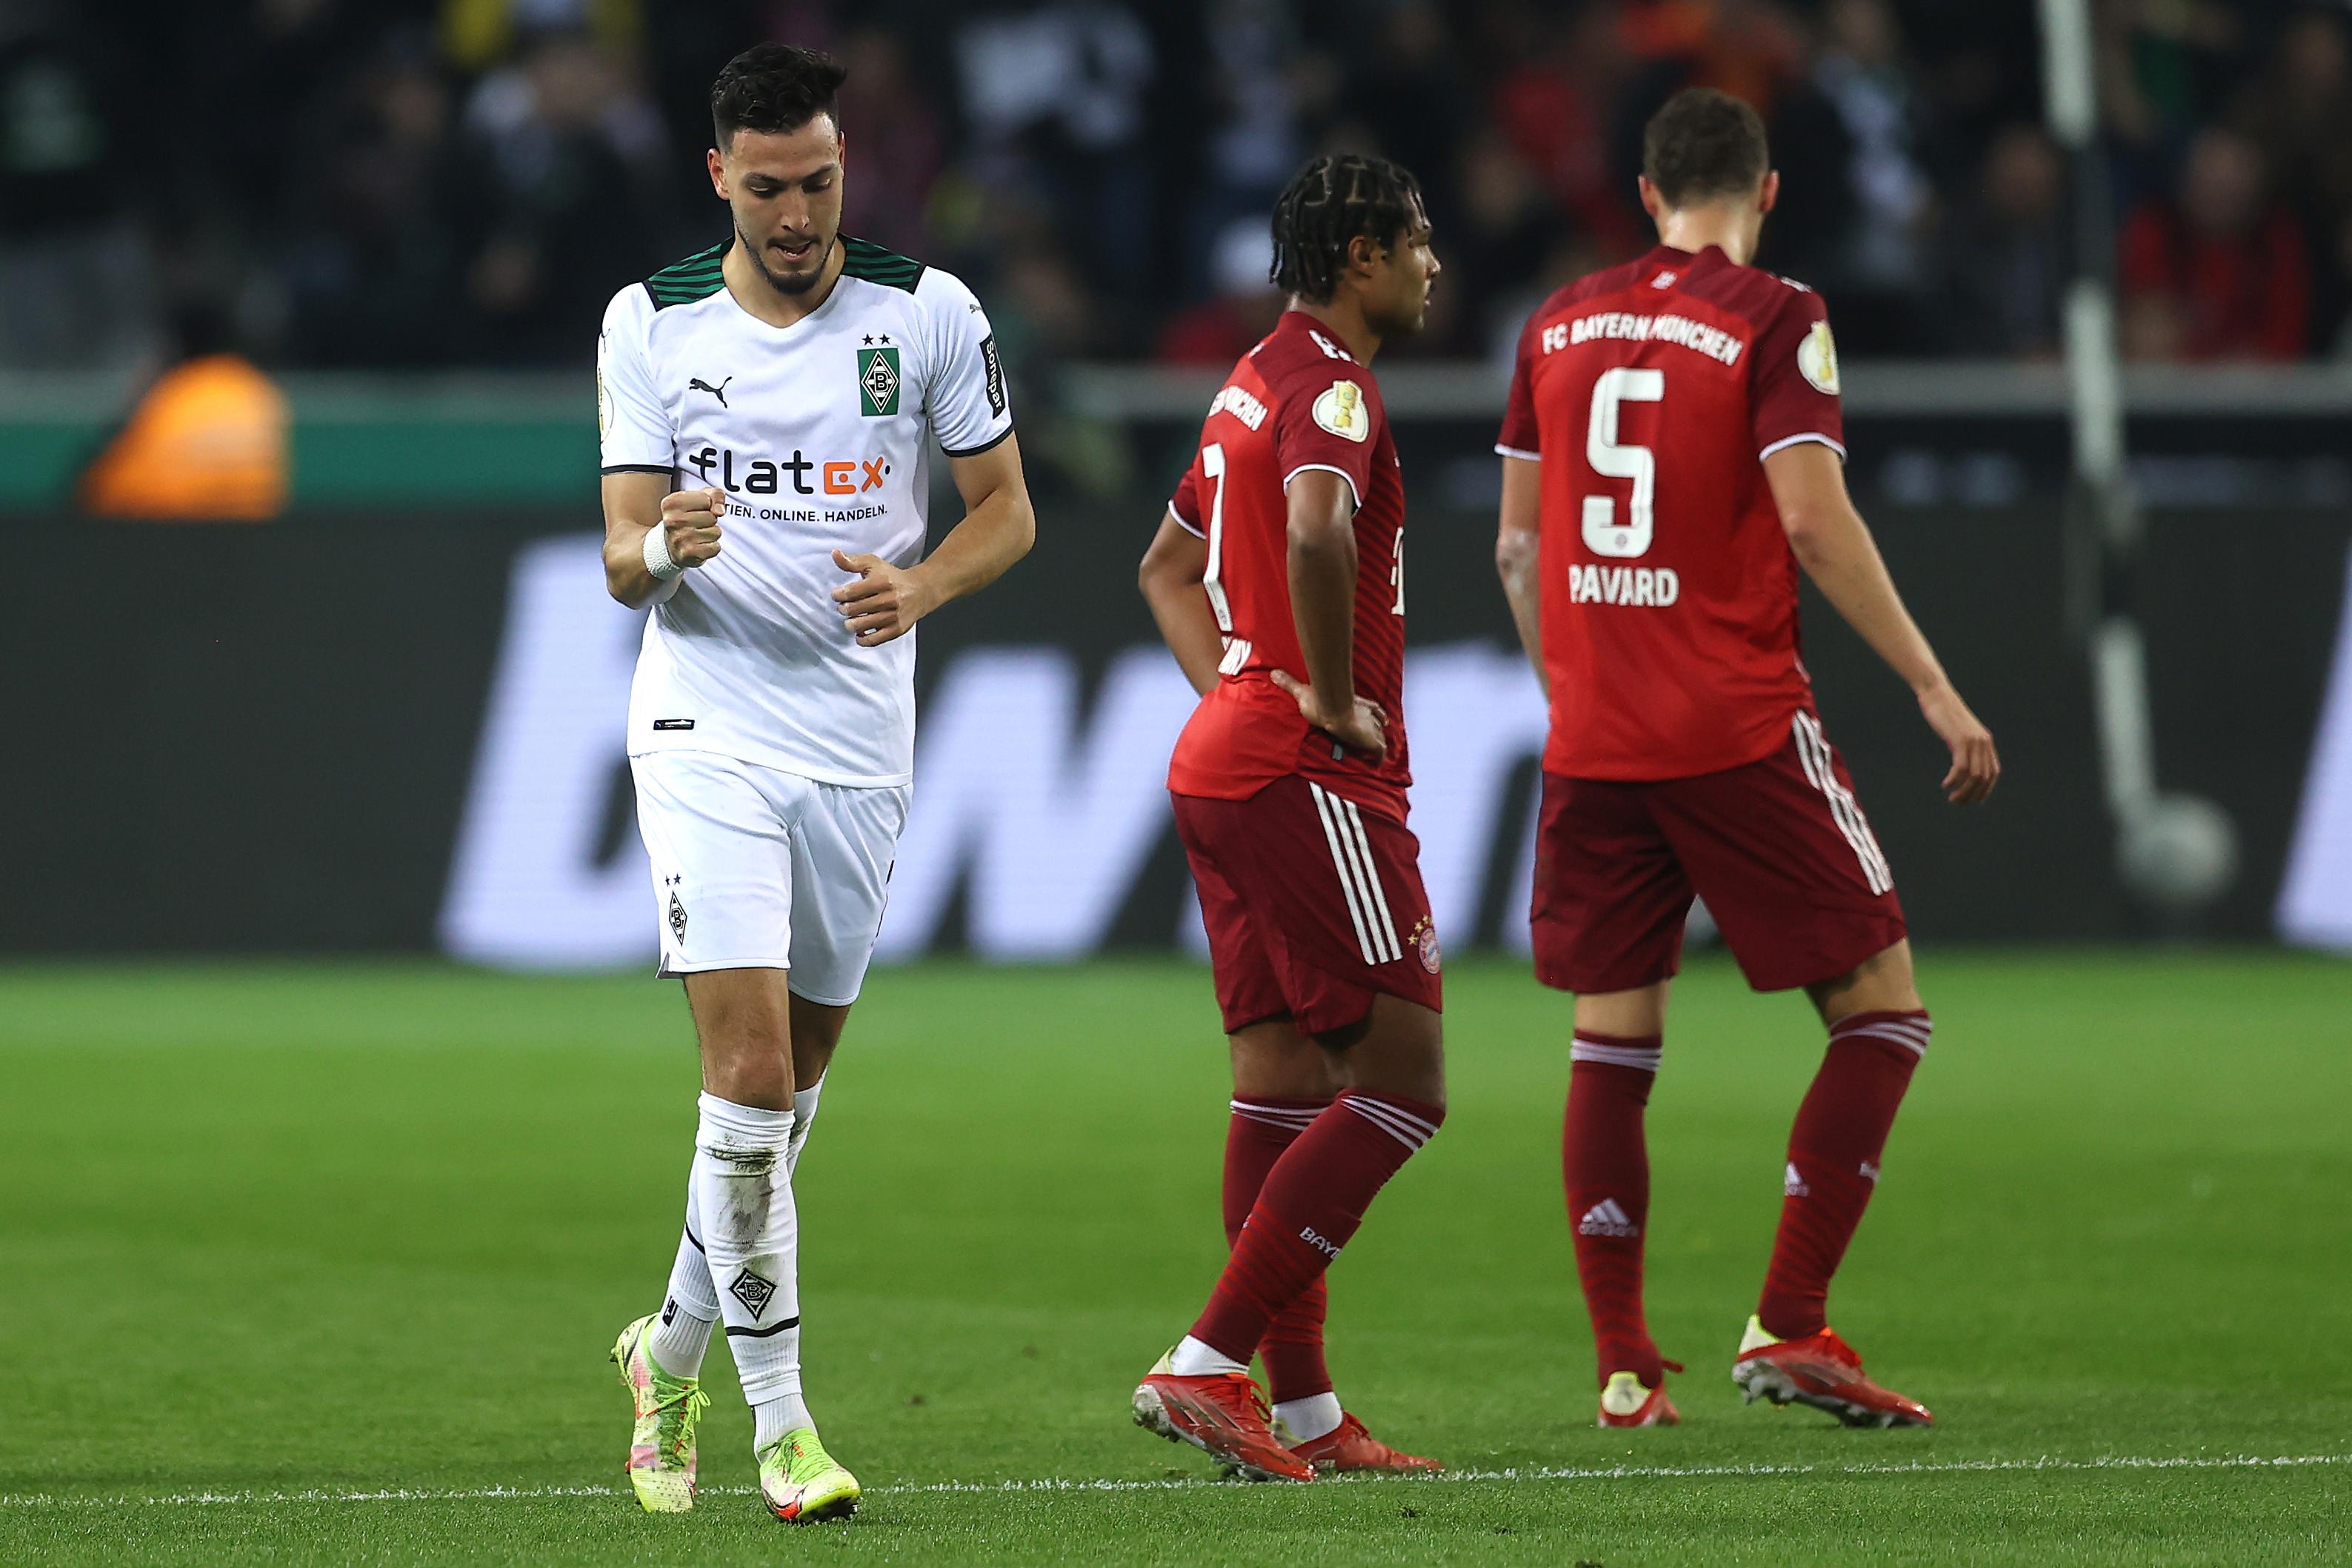 Dibantai Borussia Moenchengladbach, Bayern Munchen Ulang Memori Kelam 43 Tahun Silam - JPNN.com